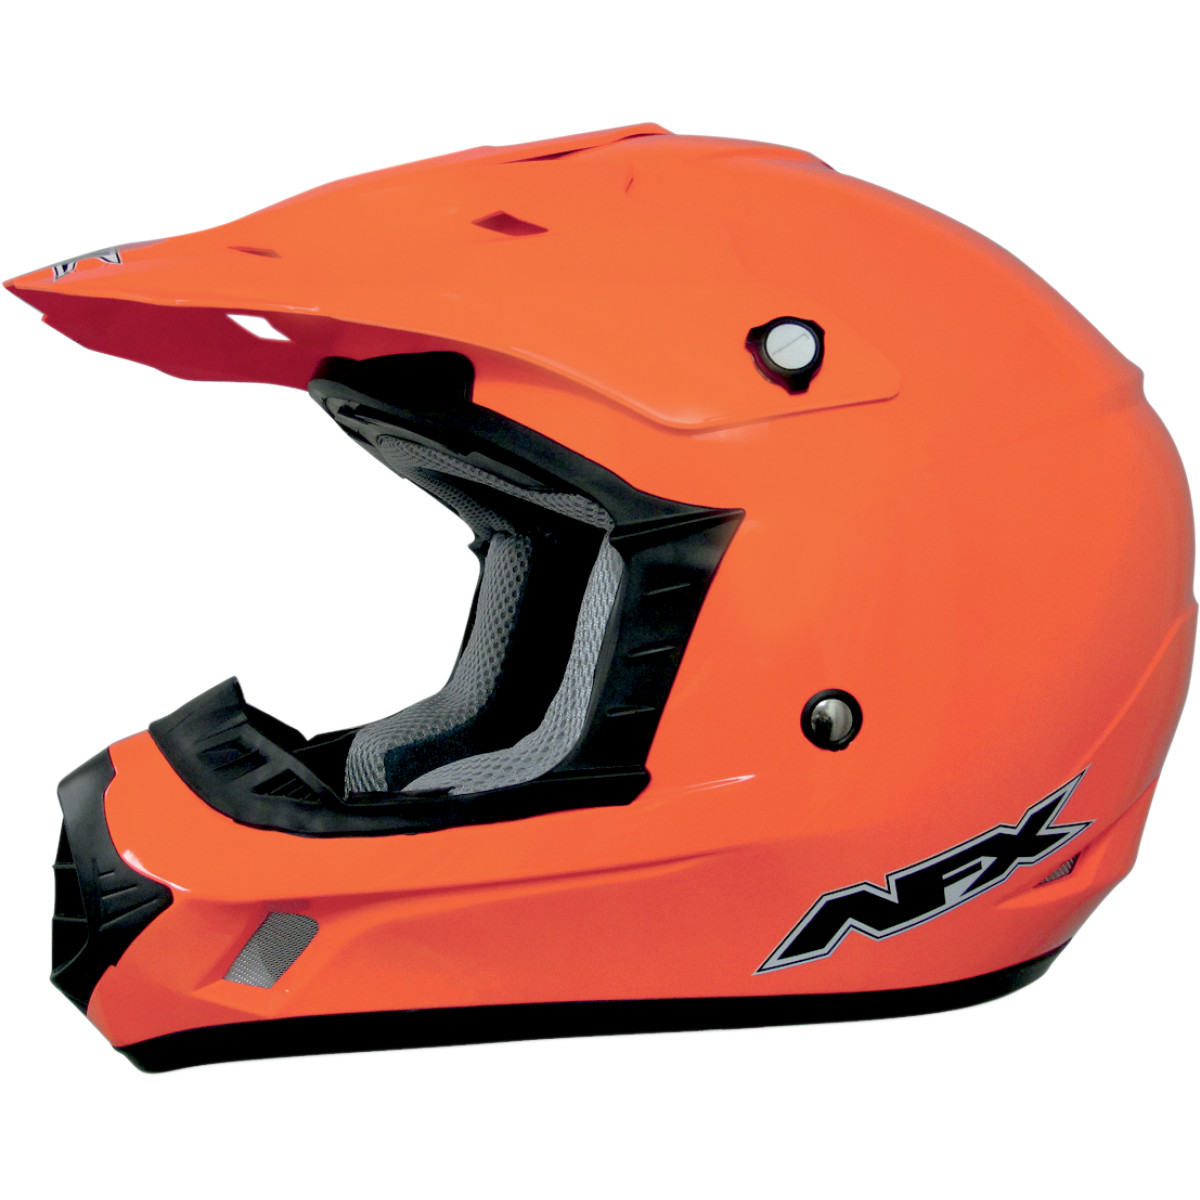 AFX FX-17Y Solid Youth MX Helmet Safety Orange